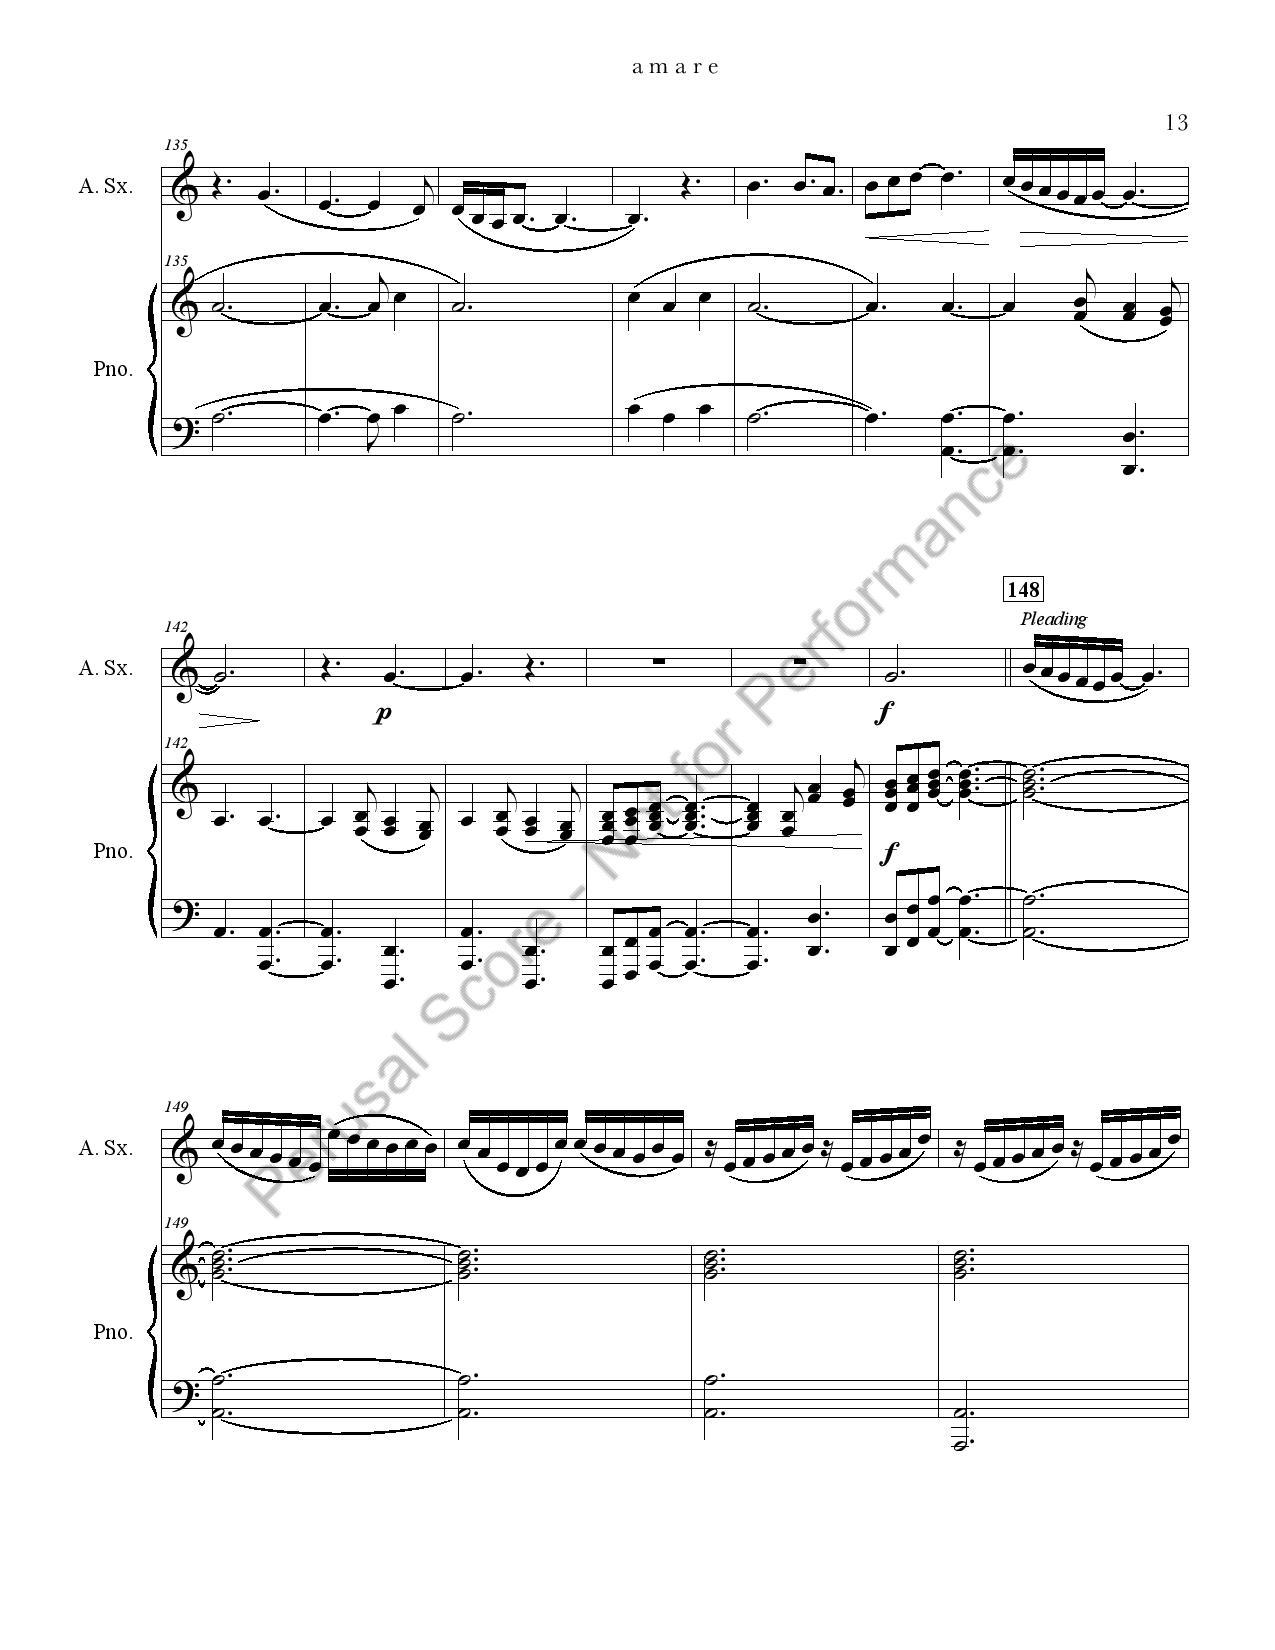 Boyd Amare Score_watermark-3-page-019.jpg